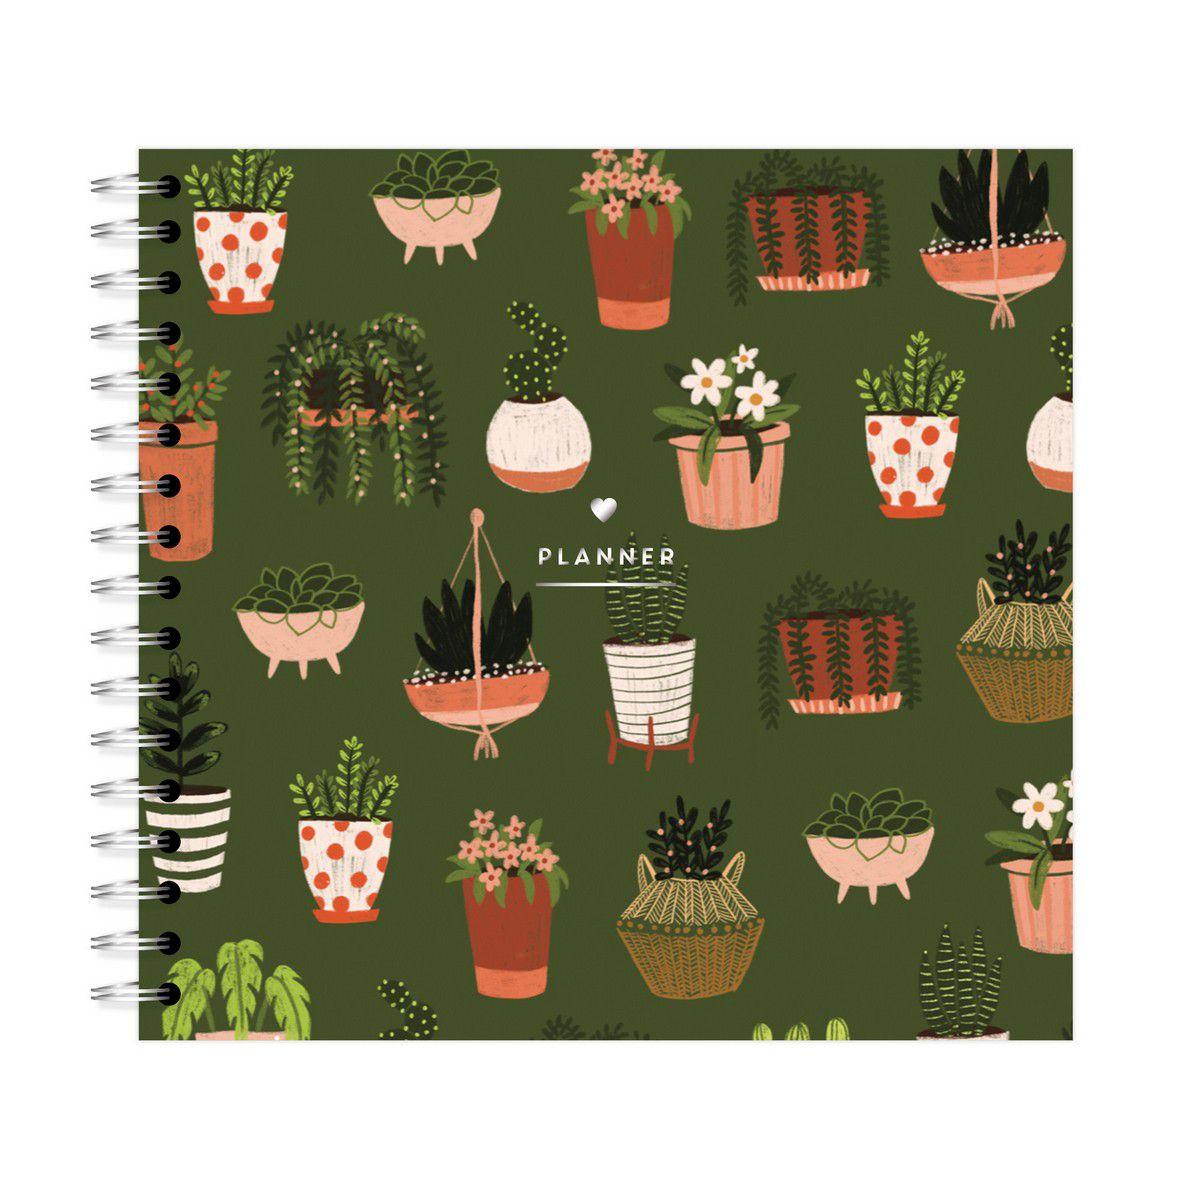 Planner Mensal Garden Vasinhos Lubi